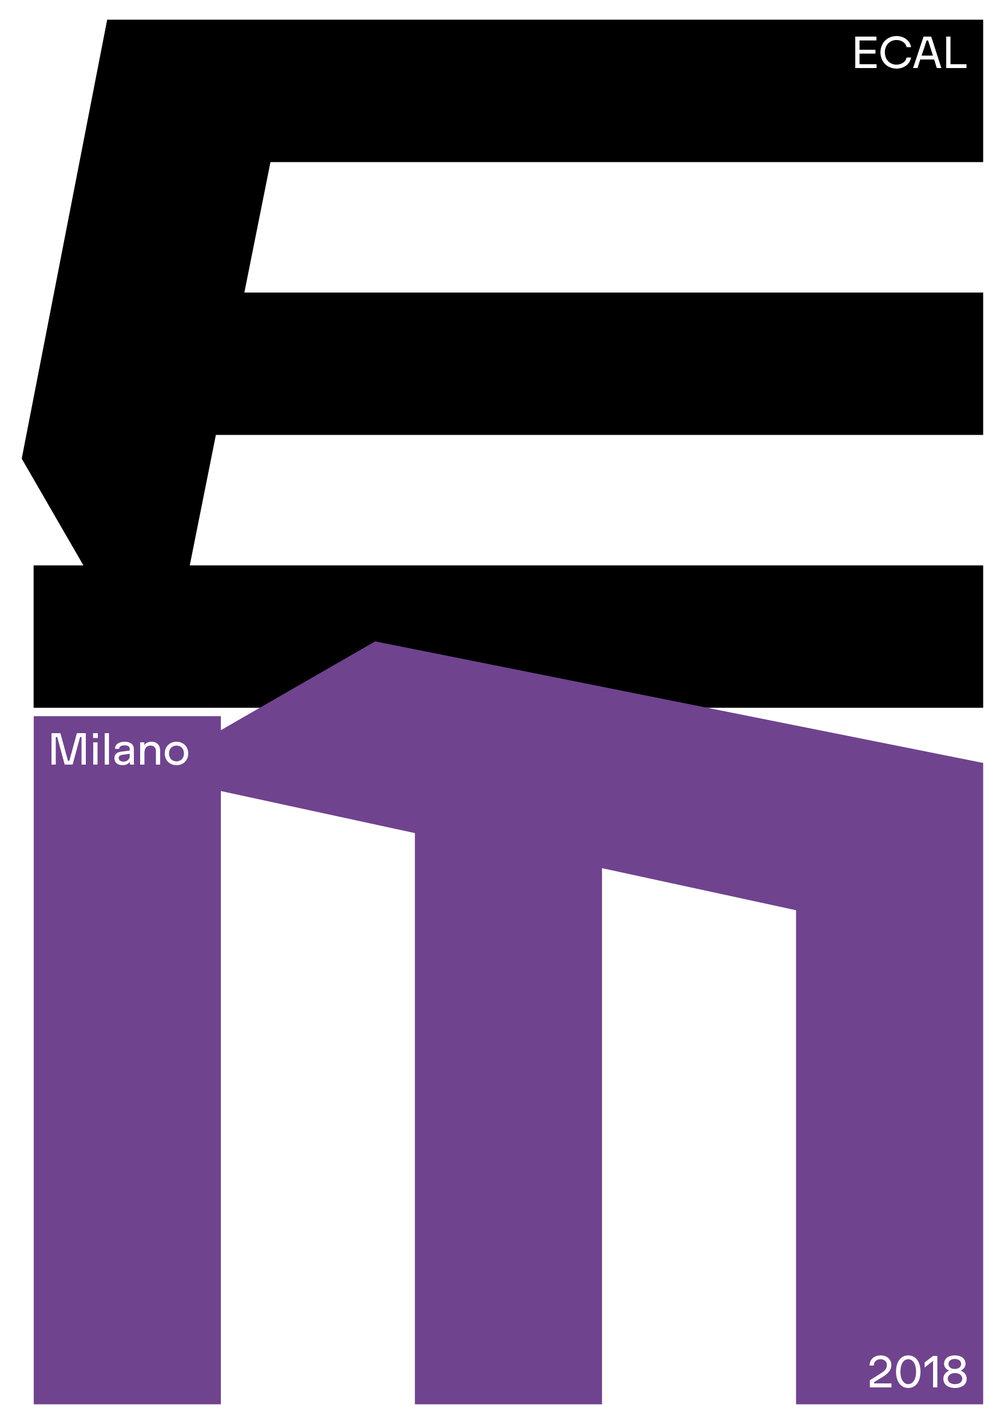 ECAL+Milano+2018